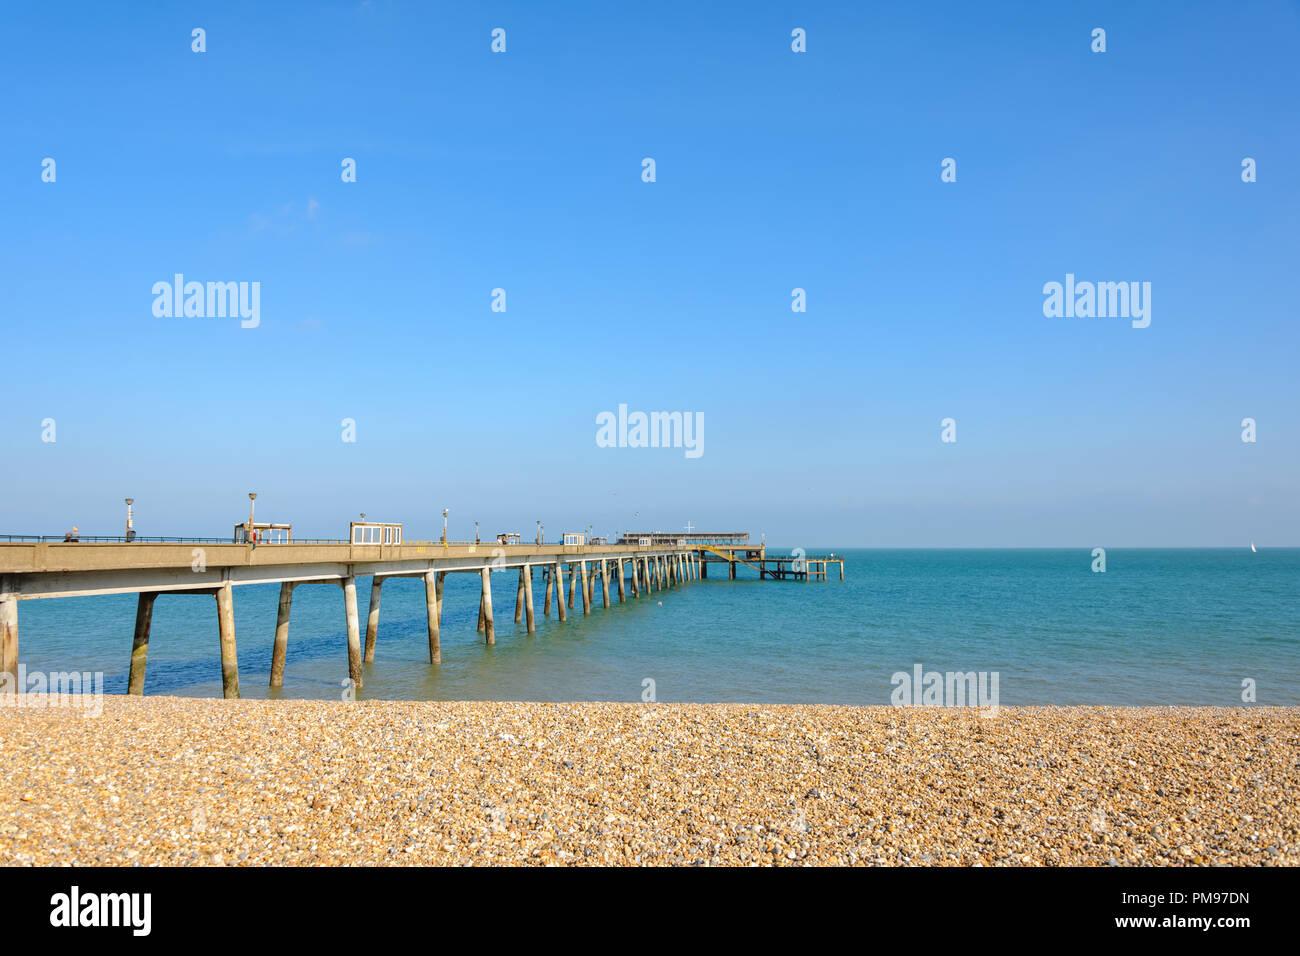 Deal Beach & Pier, Kent, UK - Stock Image